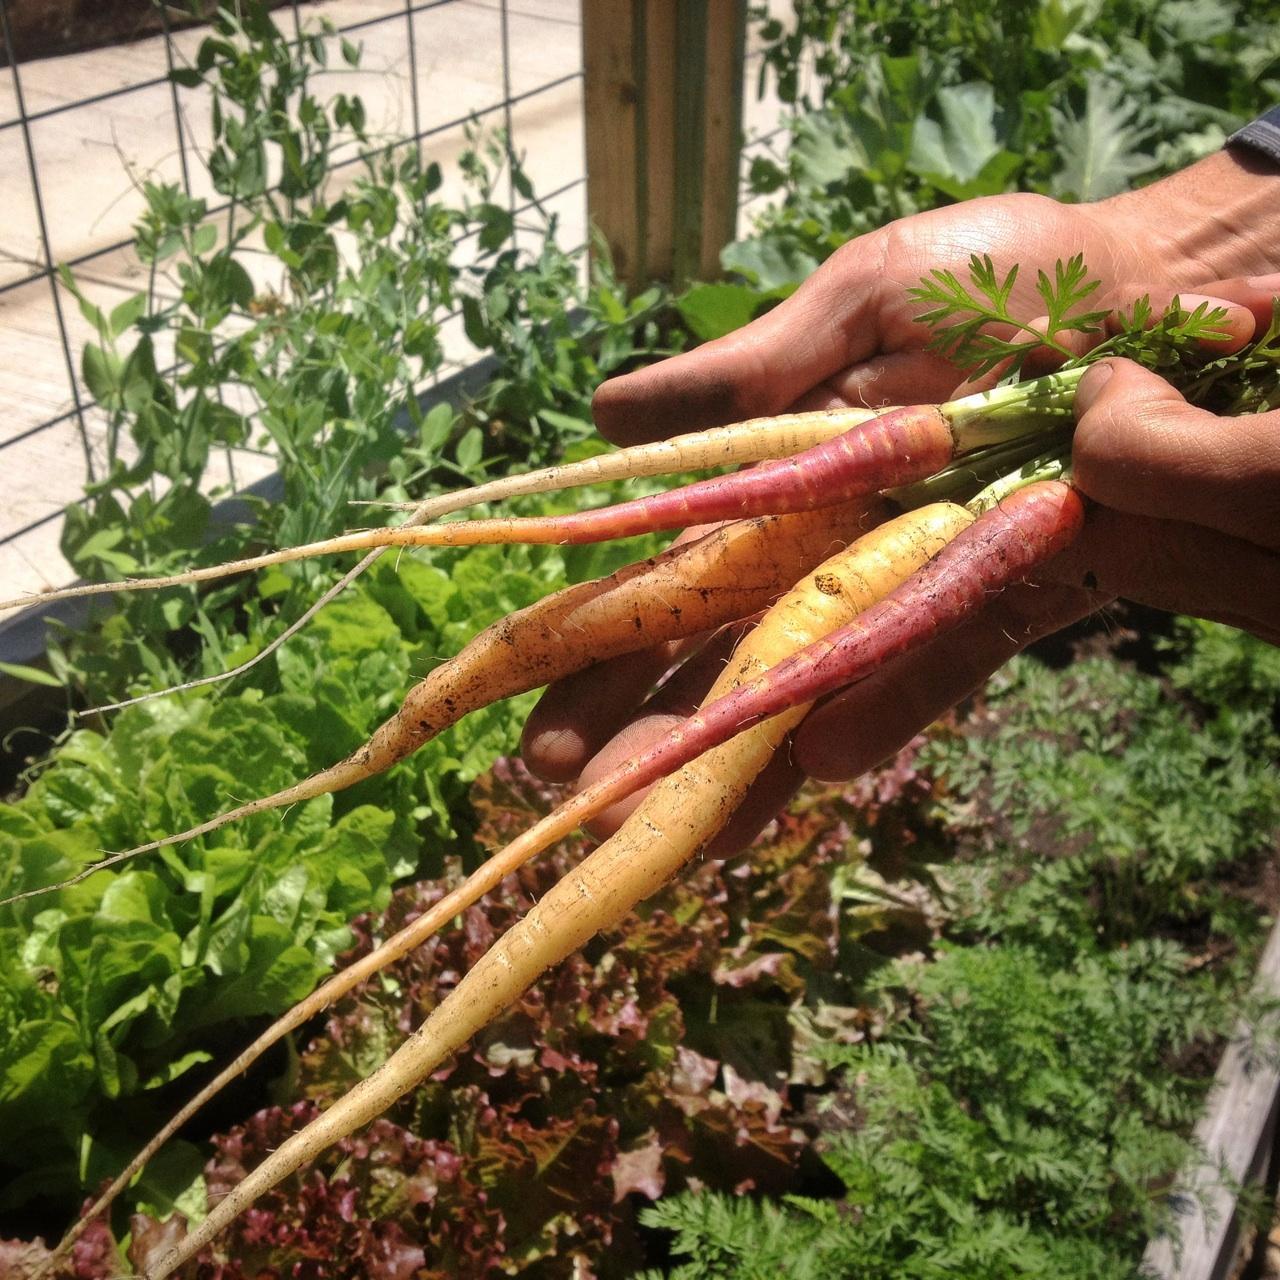 fruit, flowers, herbs & veges